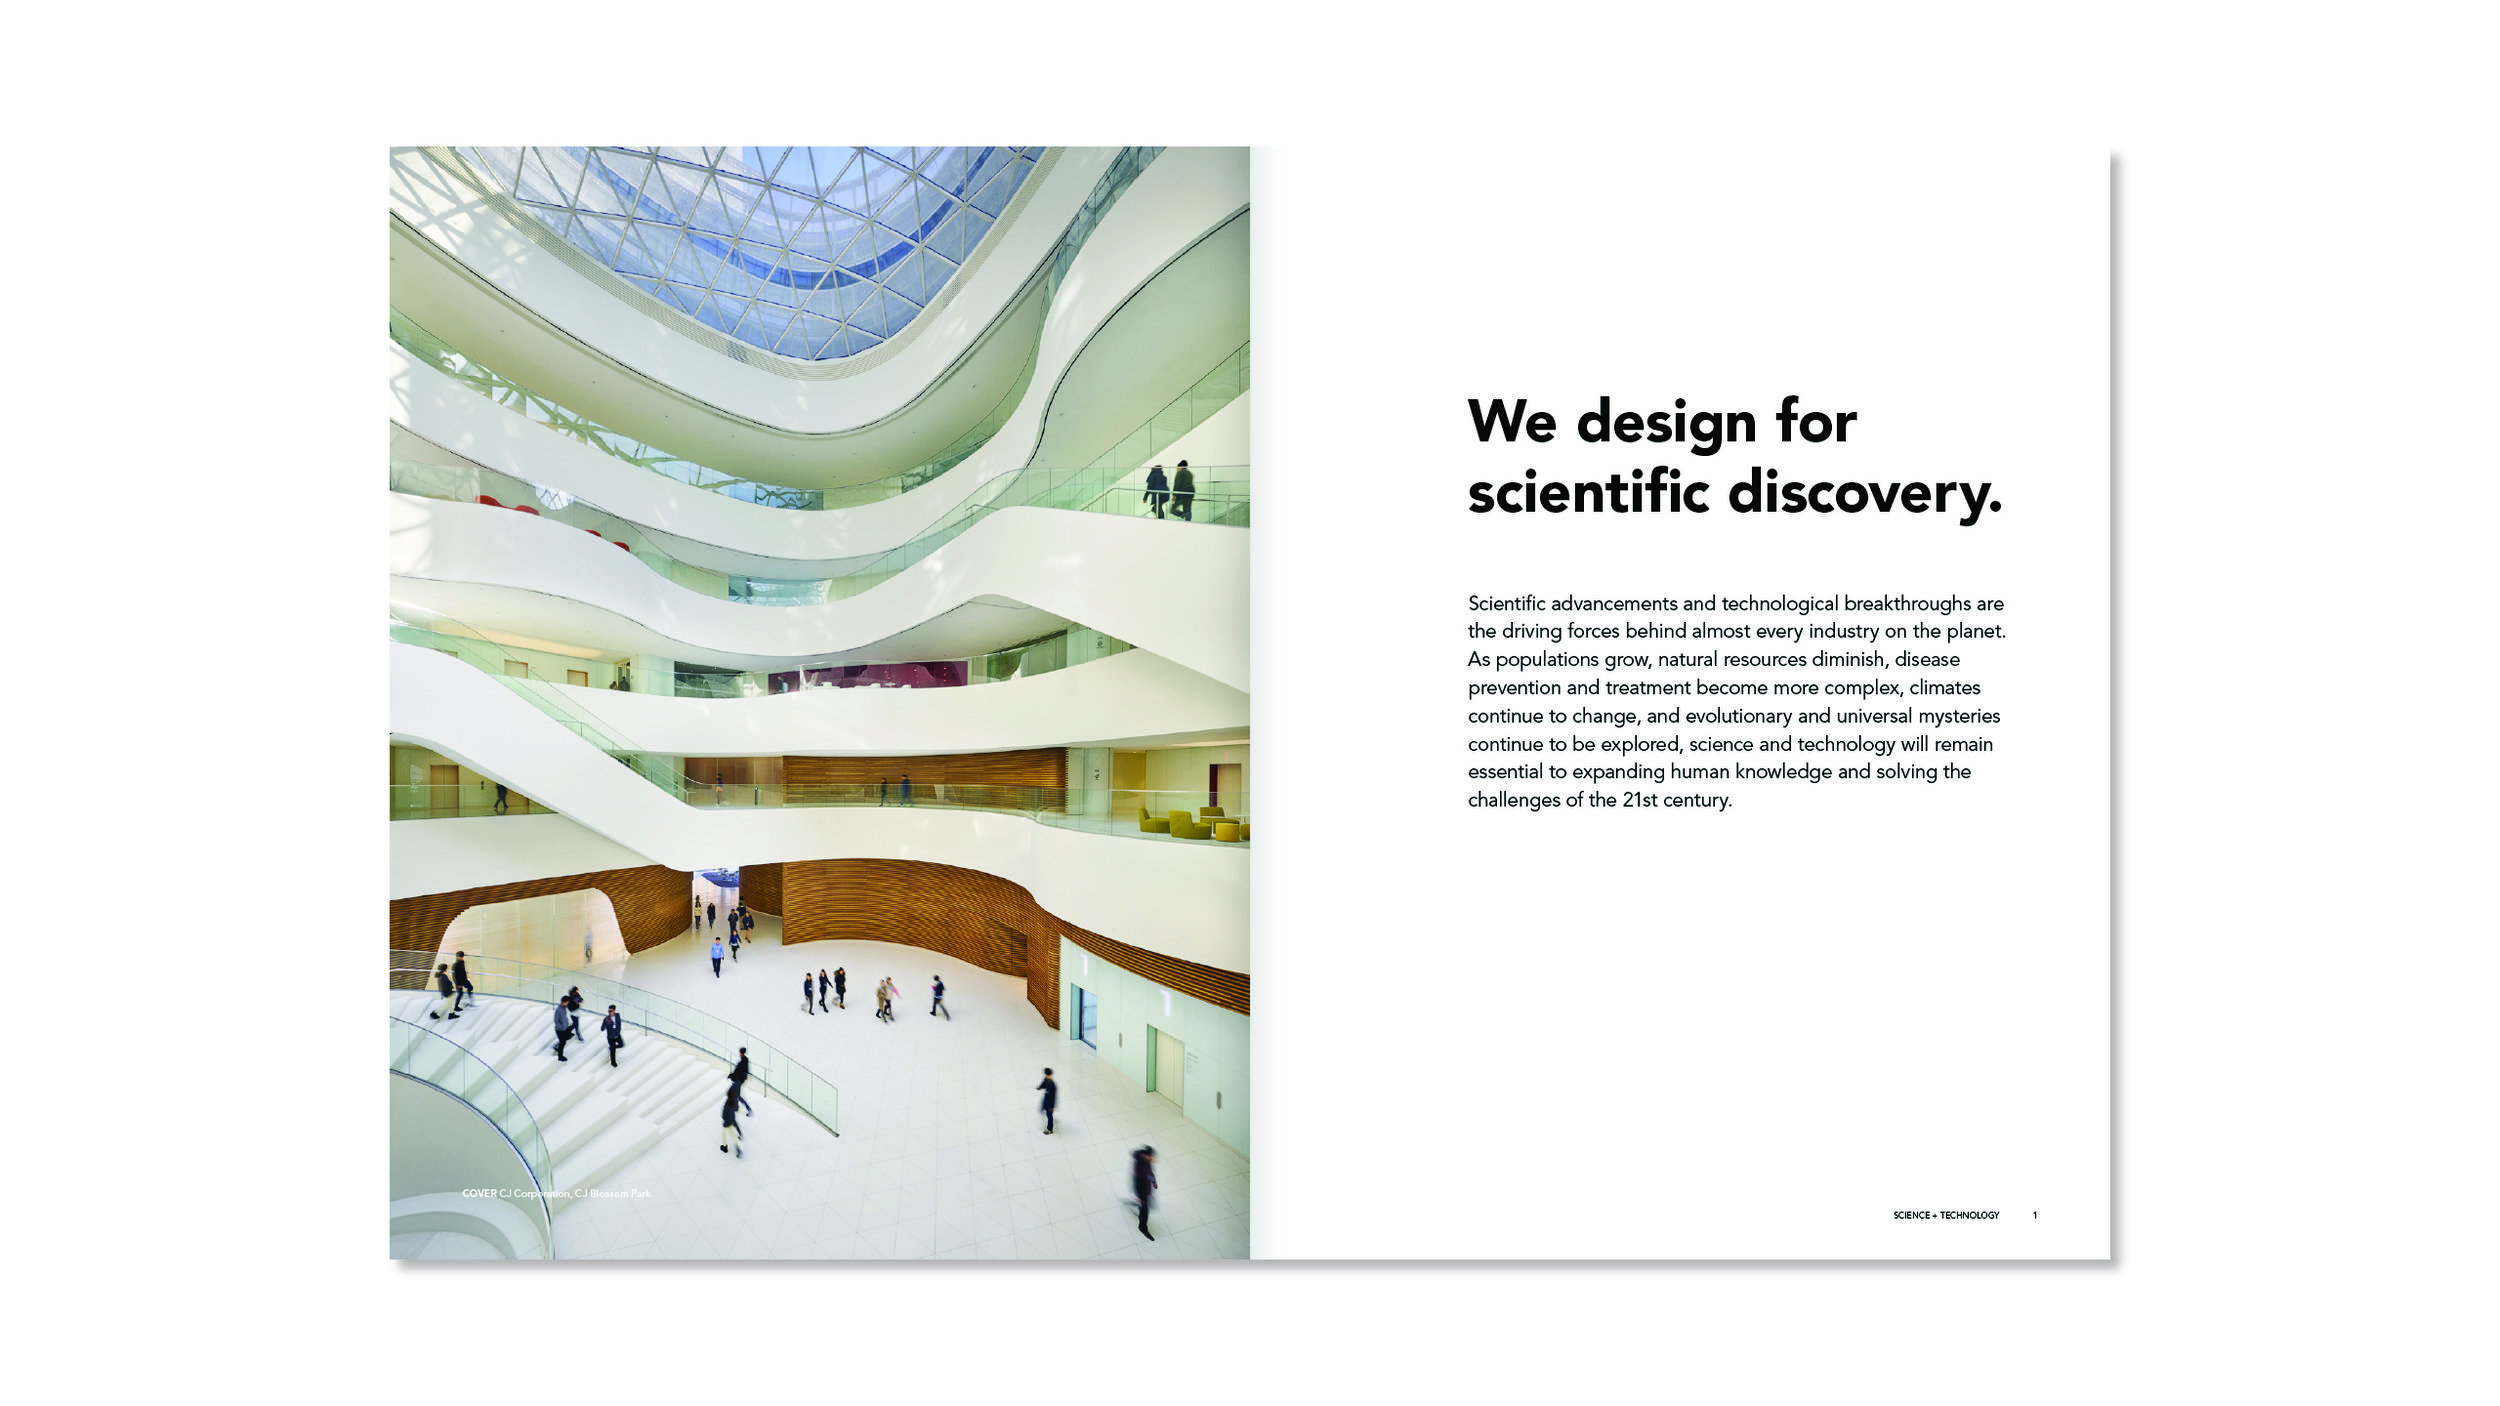 ScienceTechnology2.jpg